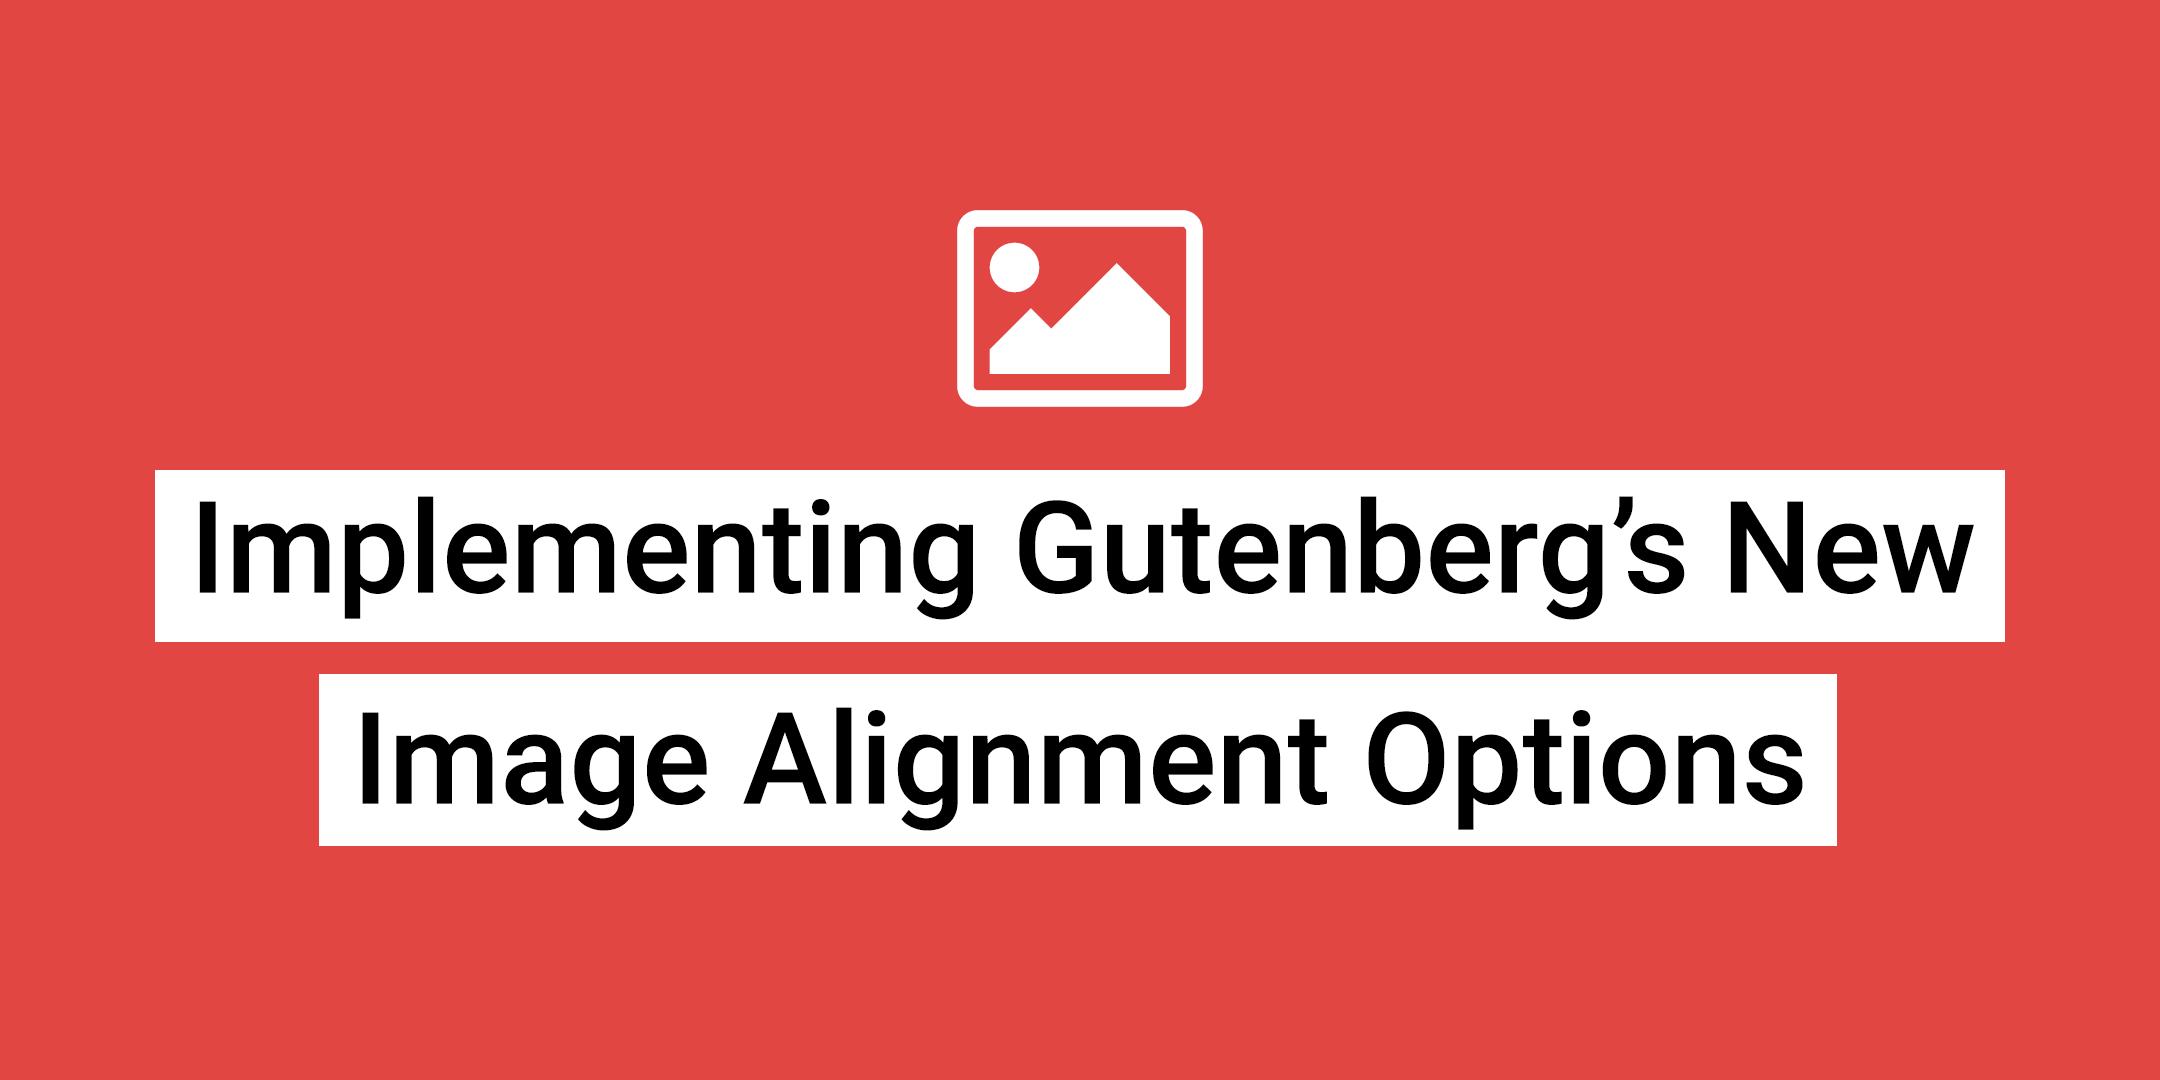 Gutenberg Image Alignment